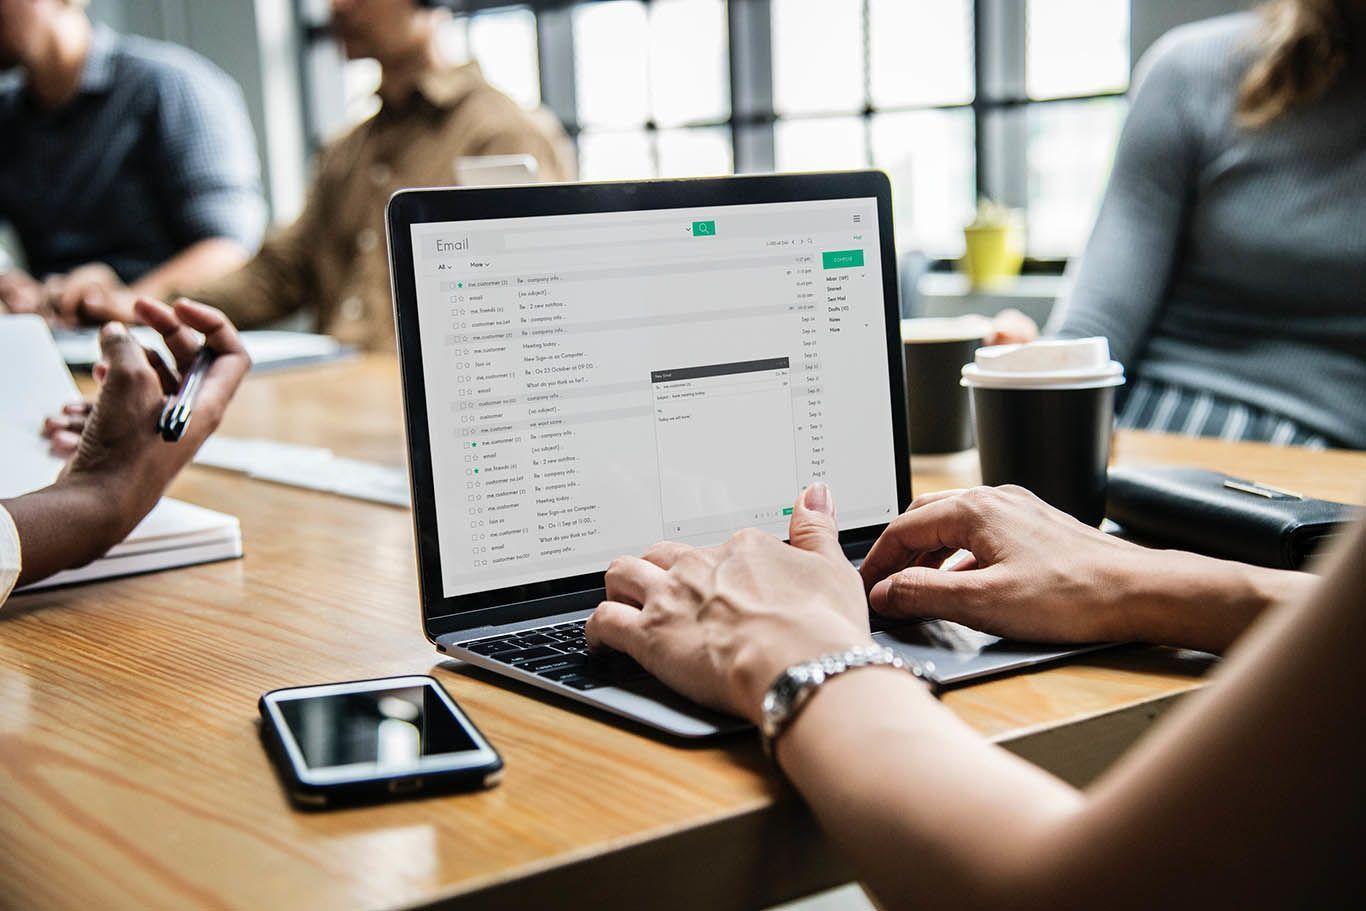 Follow Up Setelah Wawancara Kerja Dengan E-Mail Etis Enggak Sih?